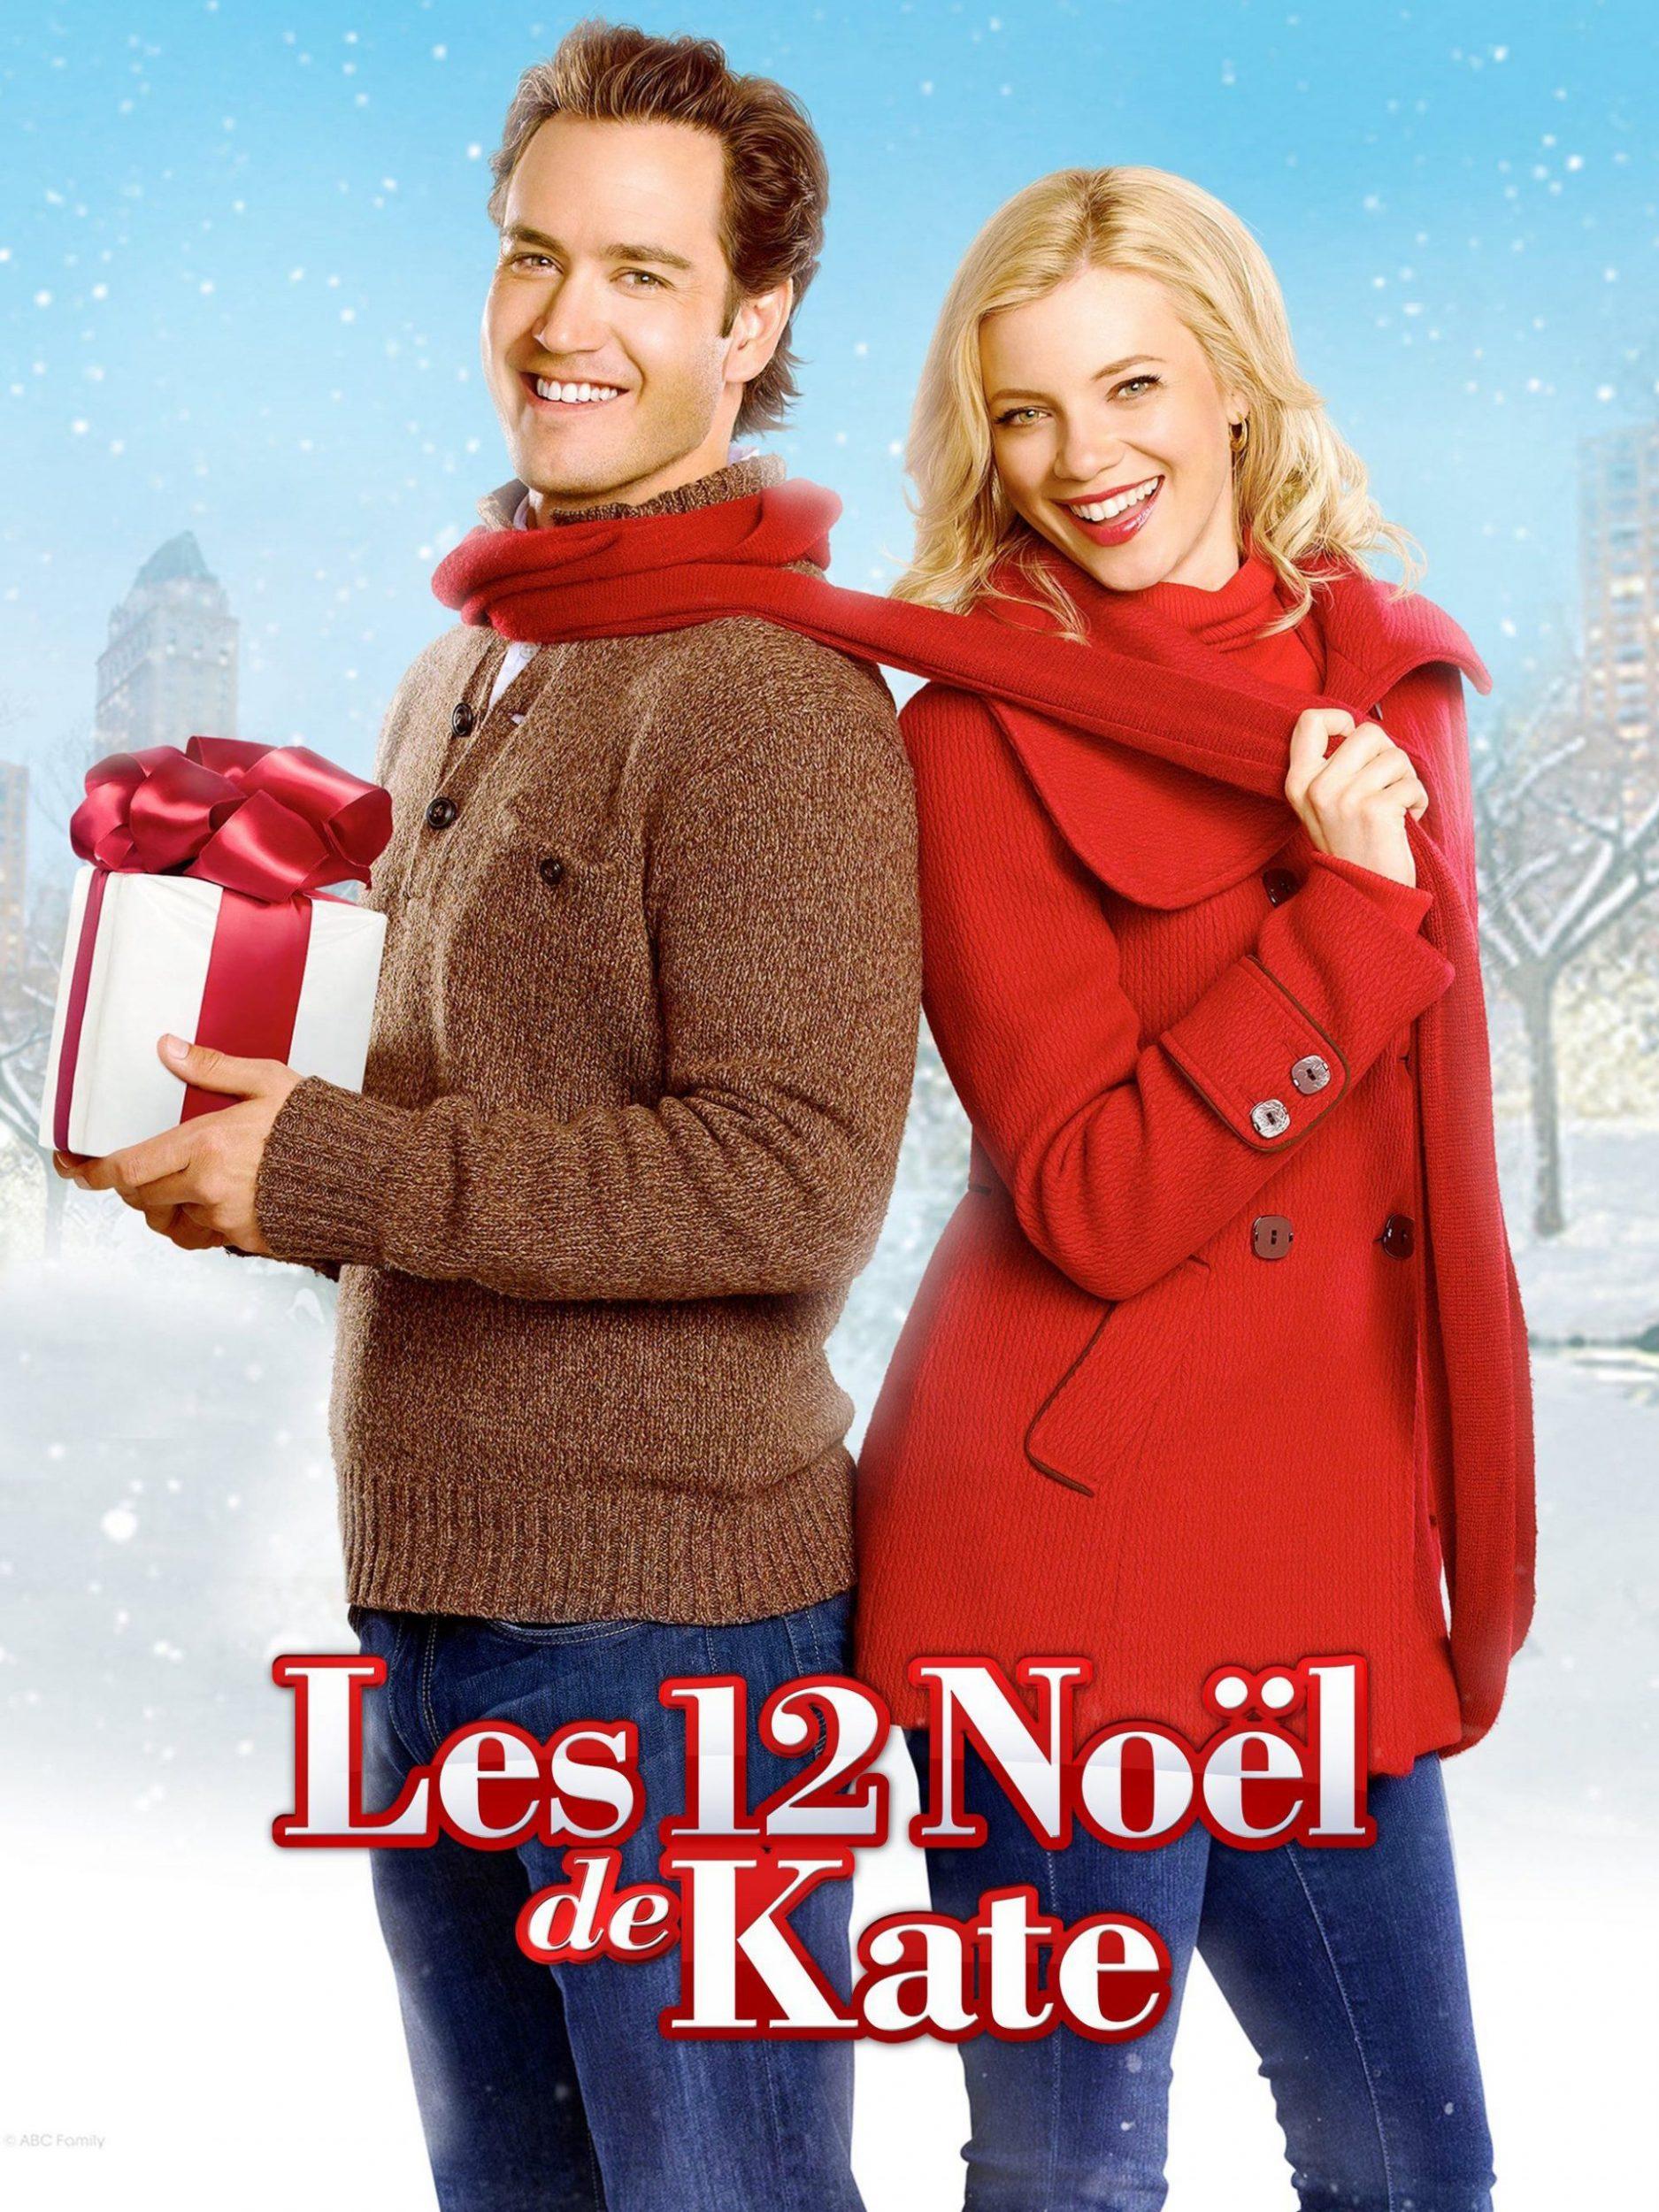 affiche poster 12 noel dates kate christmas disney